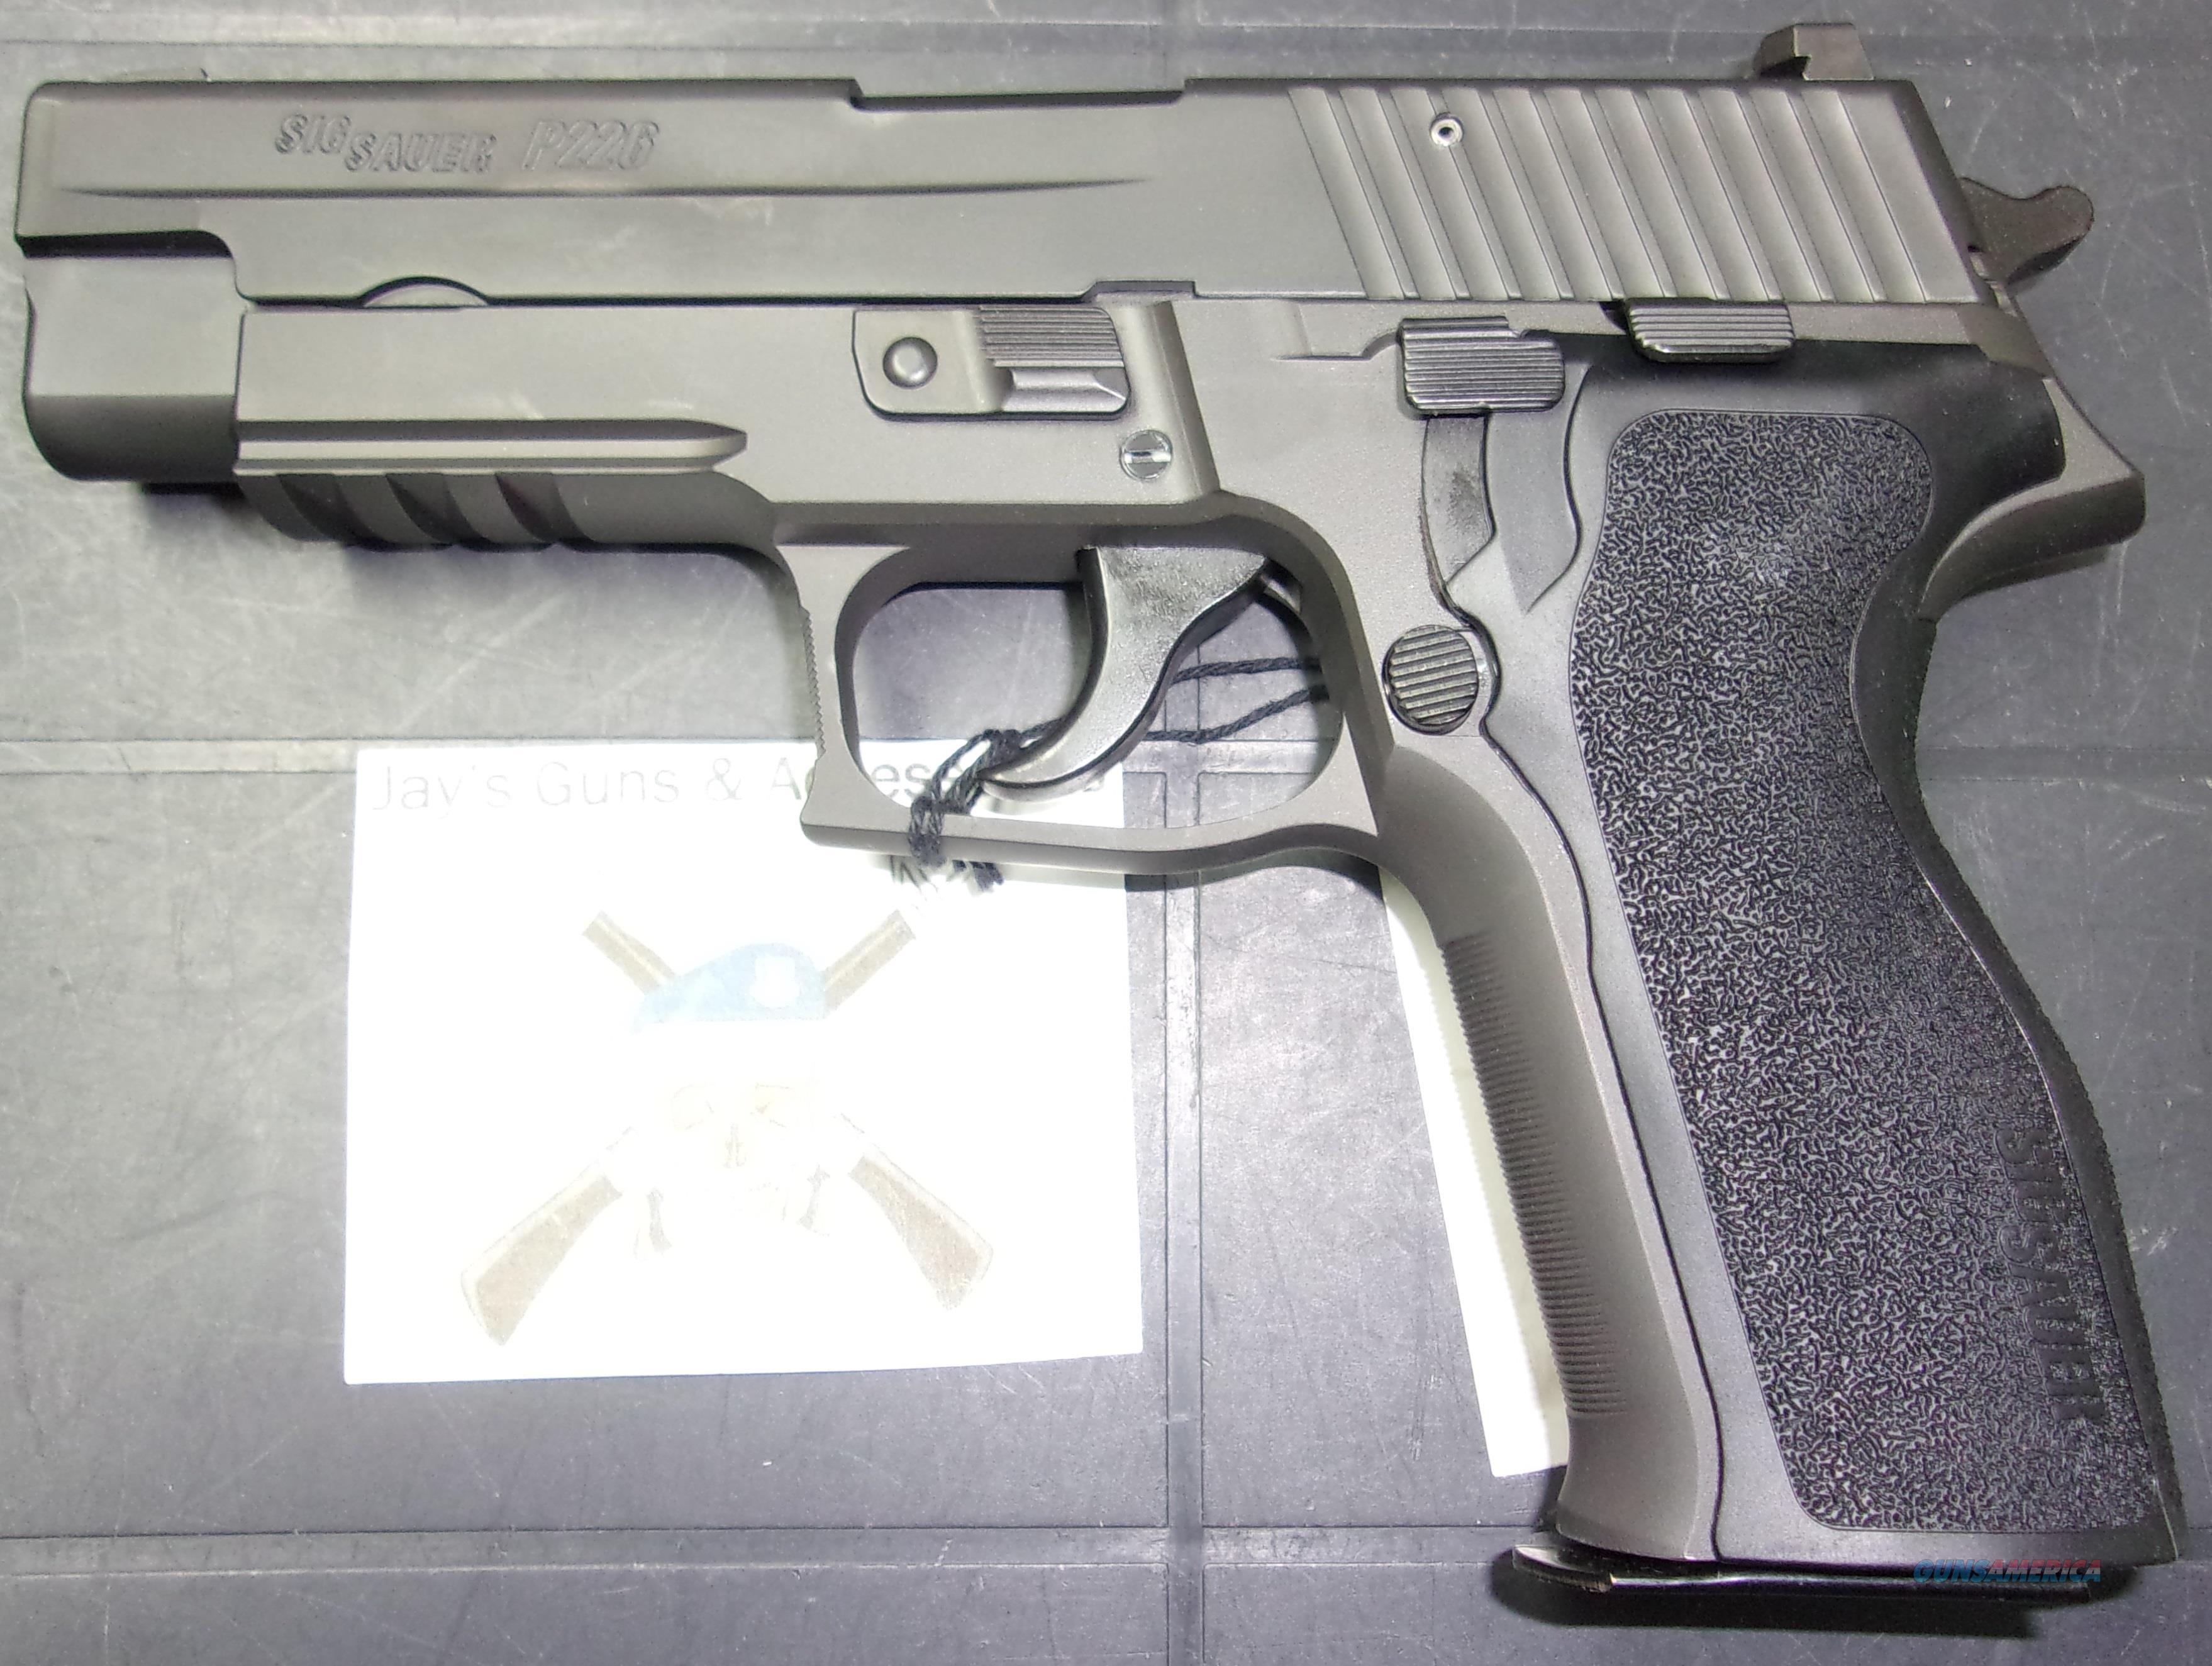 Sig Sauer P226 (UDE226-357-B1)  Guns > Pistols > Sig - Sauer/Sigarms Pistols > P226